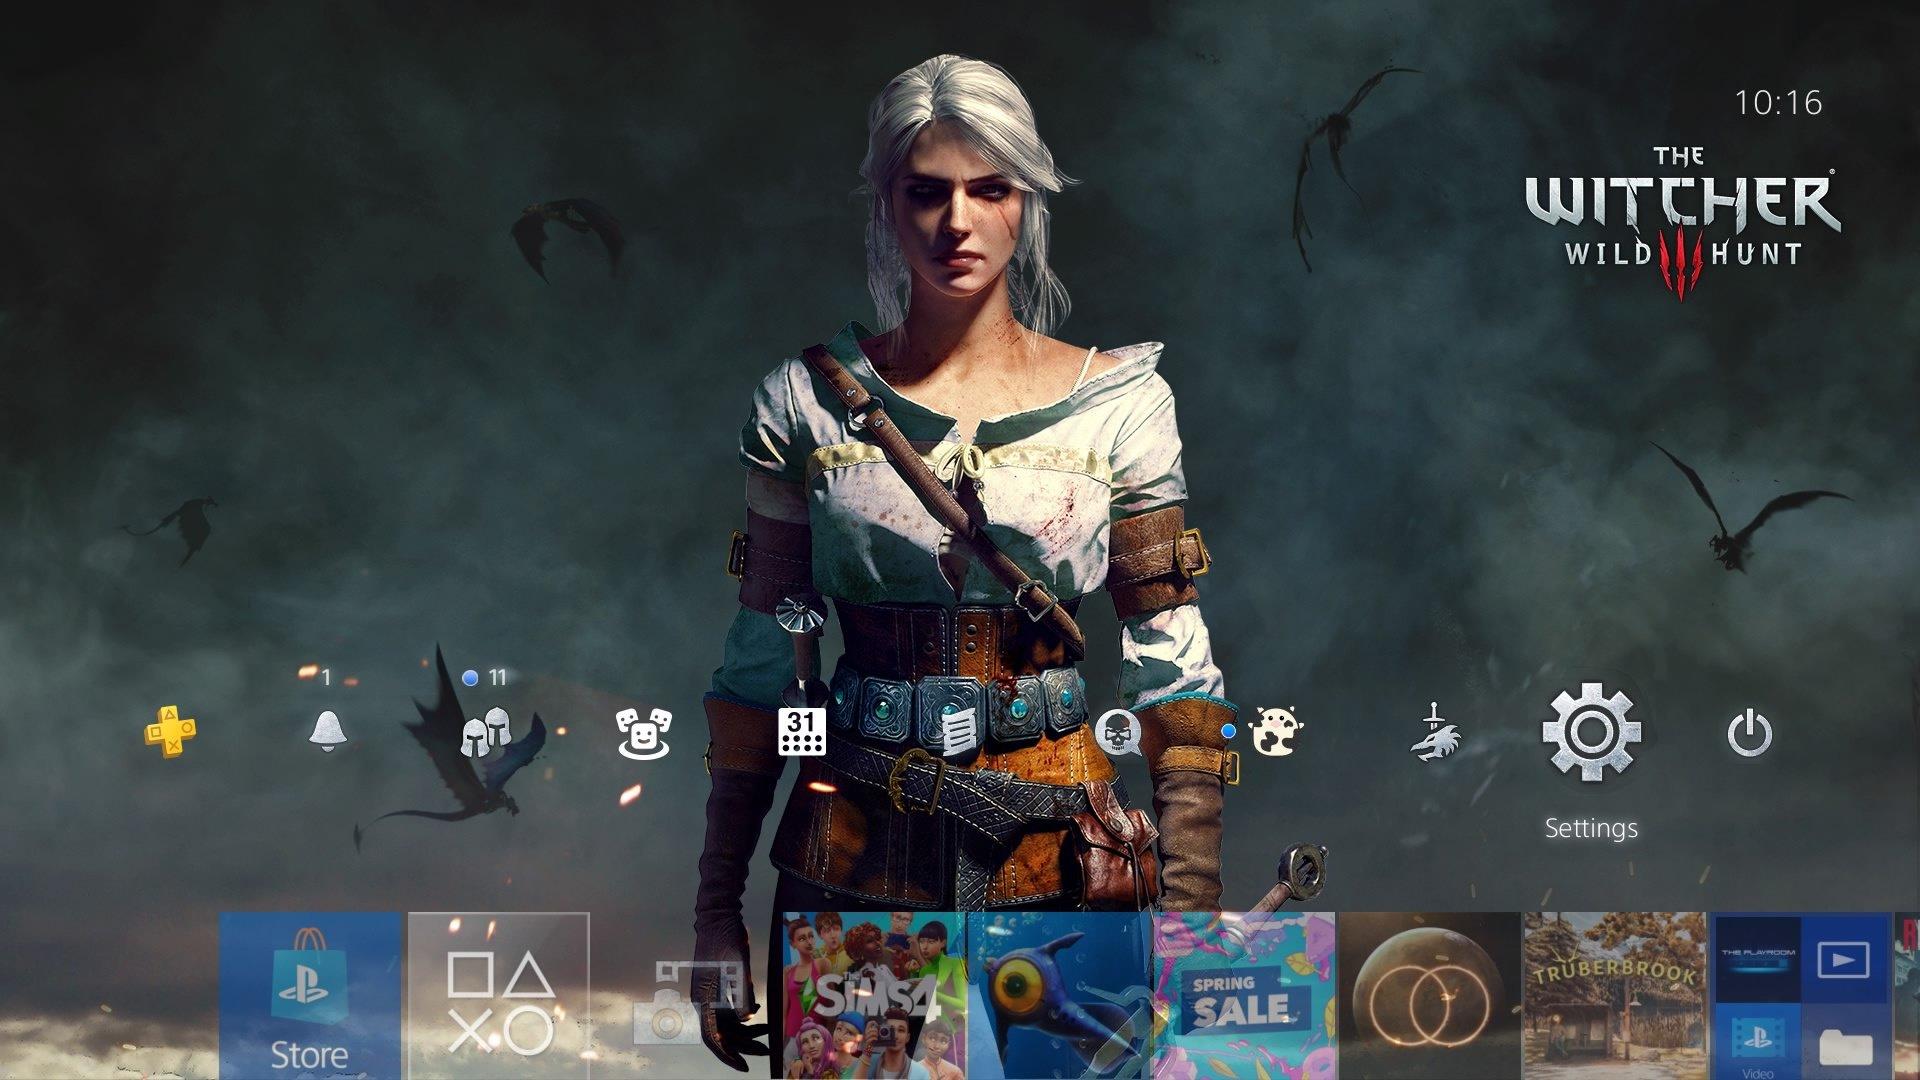 the witcher 3 wild hunt geralt and ciri theme.original - PlayStation 4 - Guida: i migliori temi gratuiti da scaricare